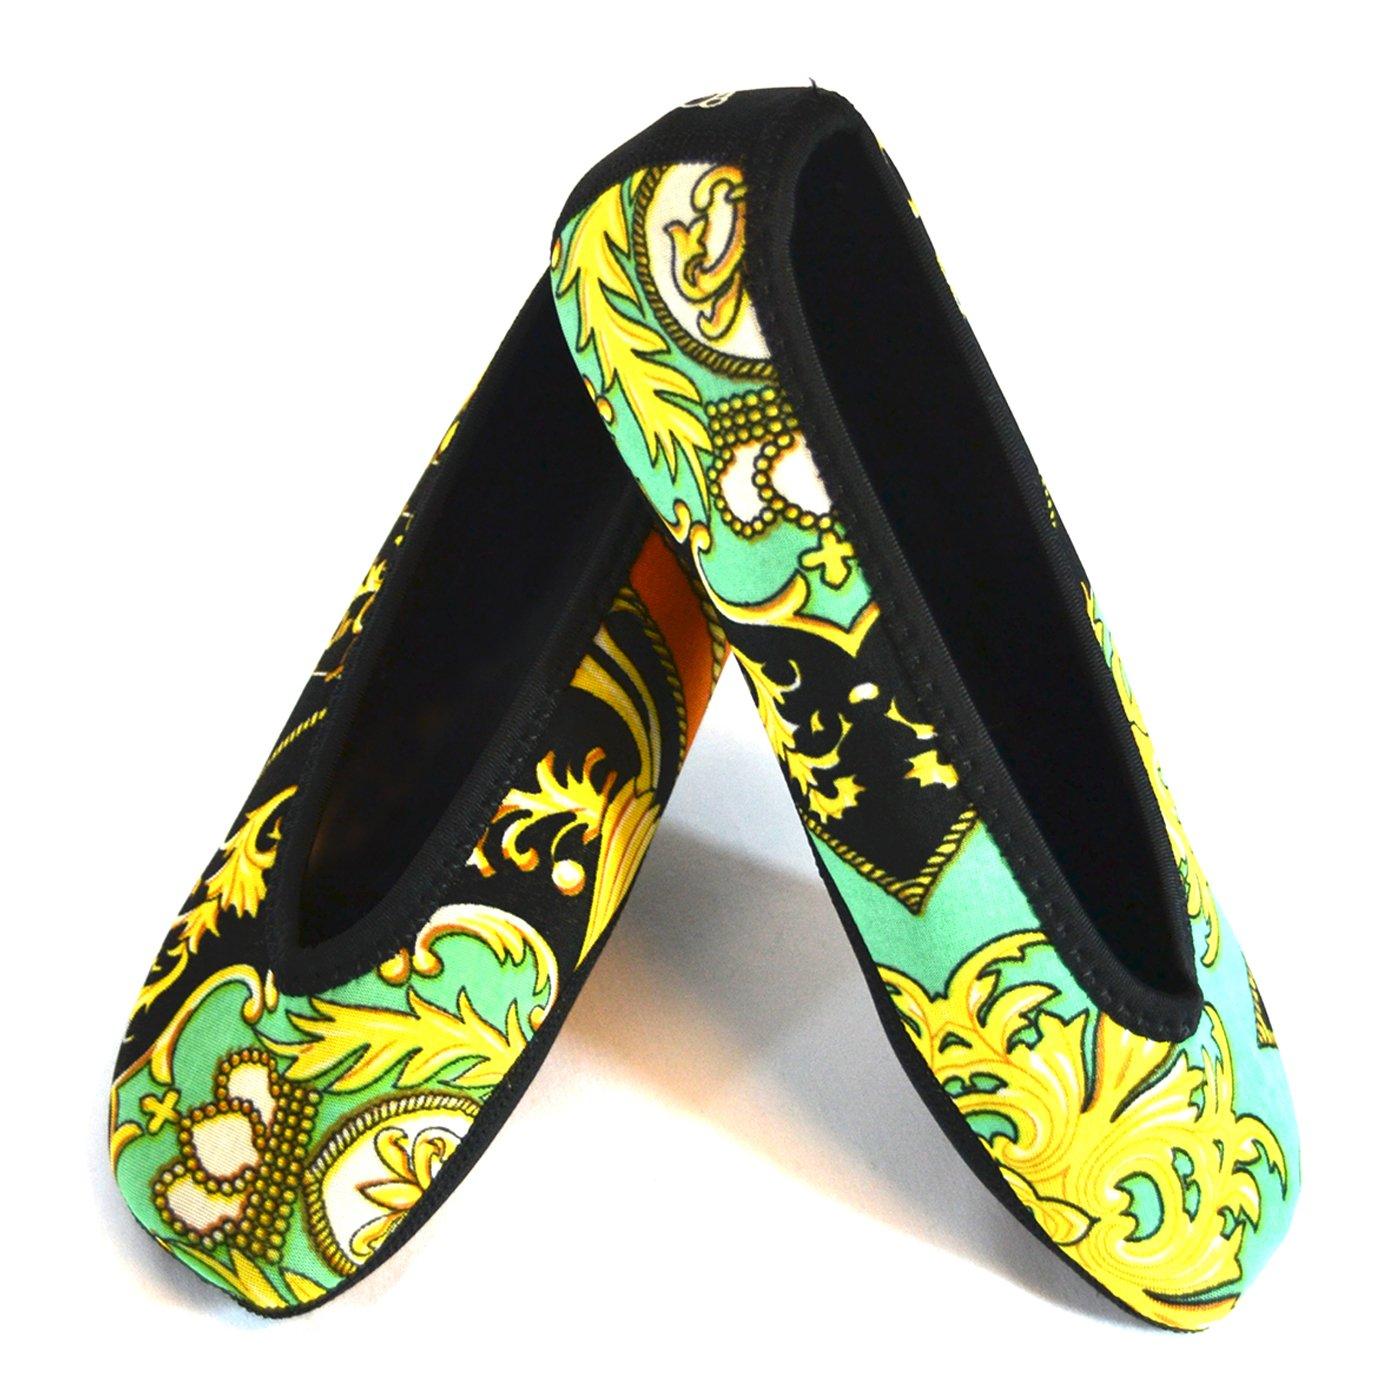 Nufoot Ballet Flats Women's Shoes, Best Foldable & Flexible Flats, Slipper Socks, Travel Slippers & Exercise Shoes, Dance Shoes, Yoga Socks, House Shoes, Indoor Slippers, Green Baroque, Extra Large